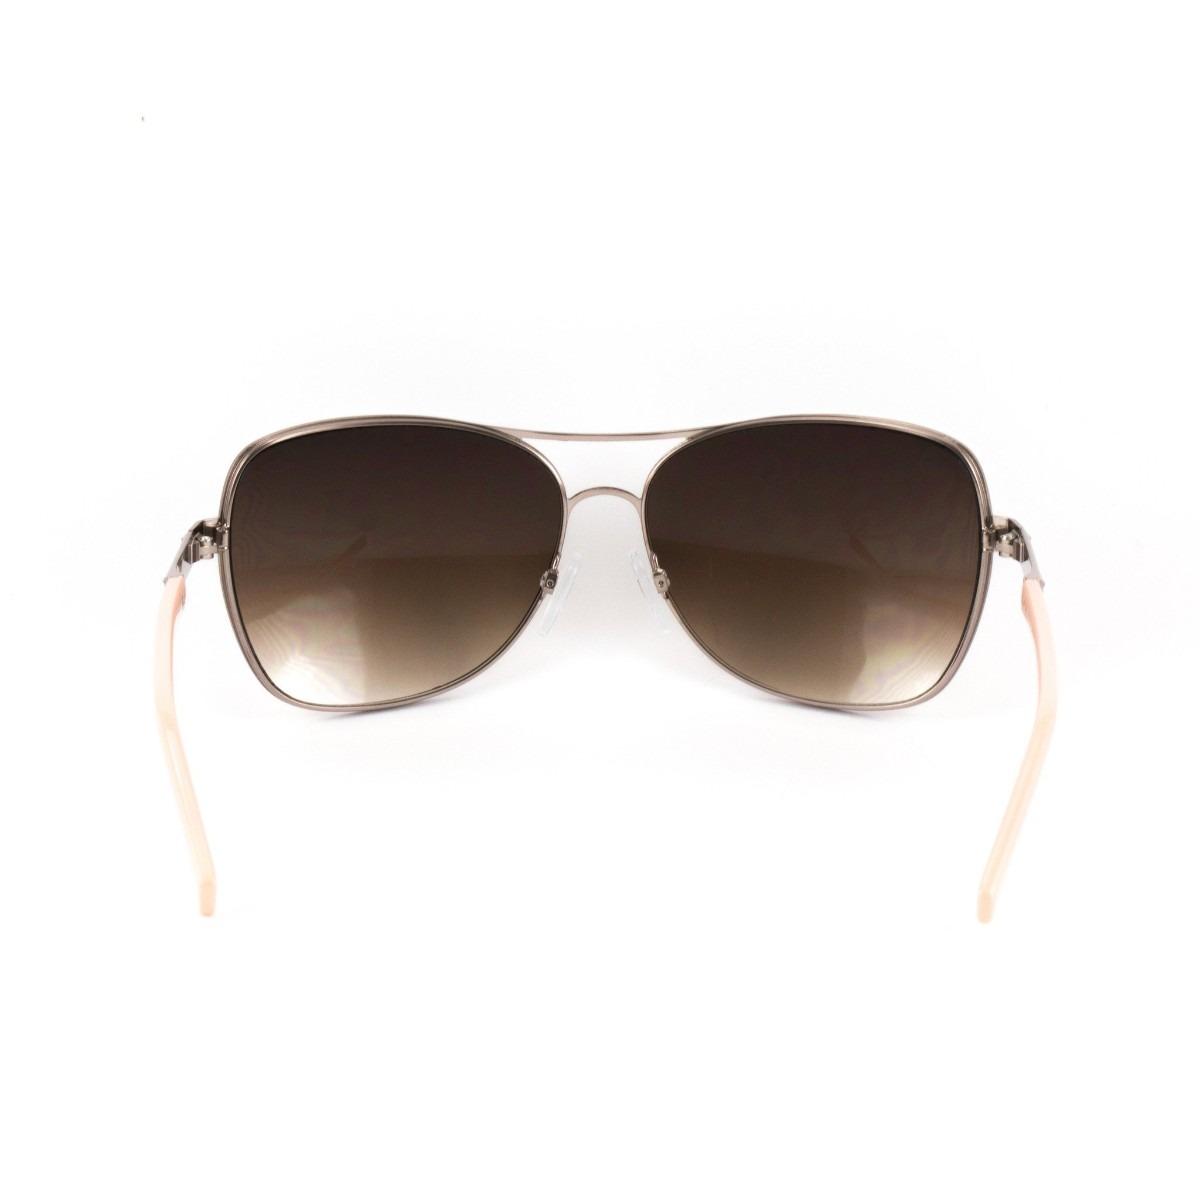 ef9281a7d1f54 óculos de sol bulget - bg 3158 01a. Carregando zoom.